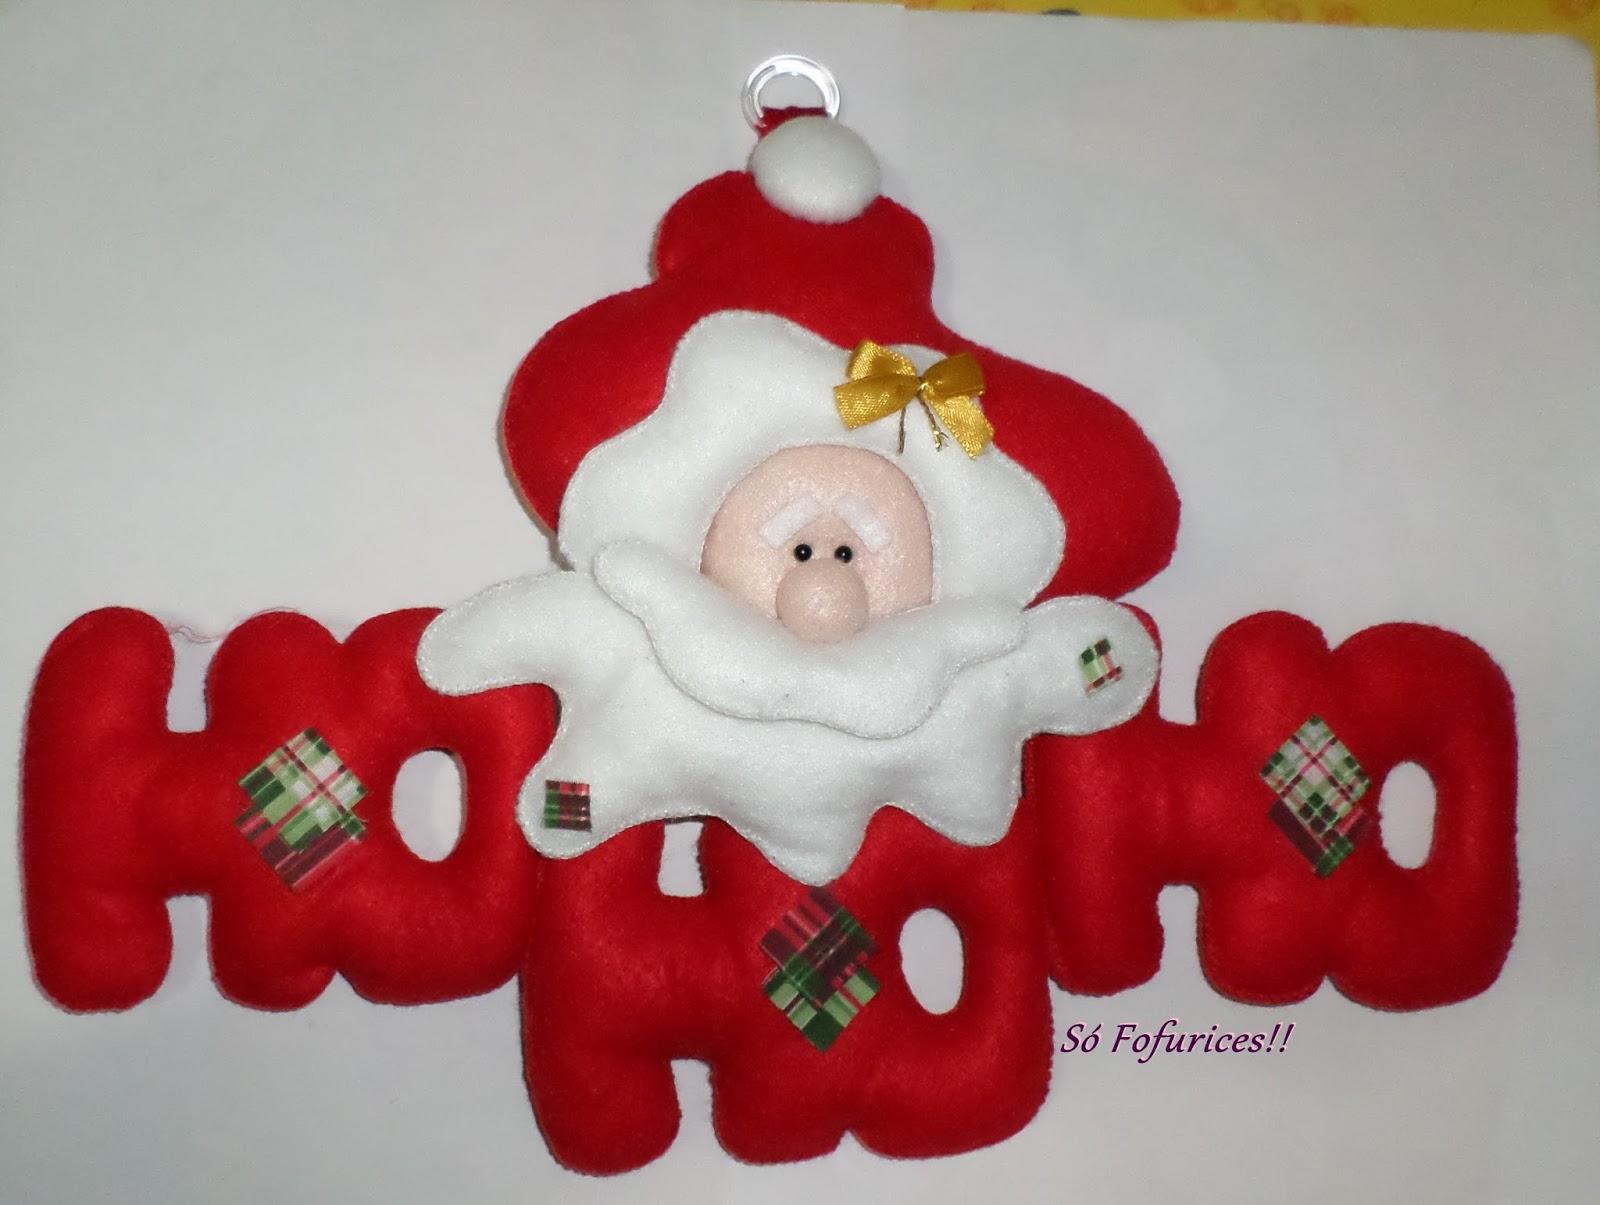 Enfeite De Natal ~ Feltro Fácil Heróis em Feltro Feltro Pinterest Feltro, Ems e Artesanato